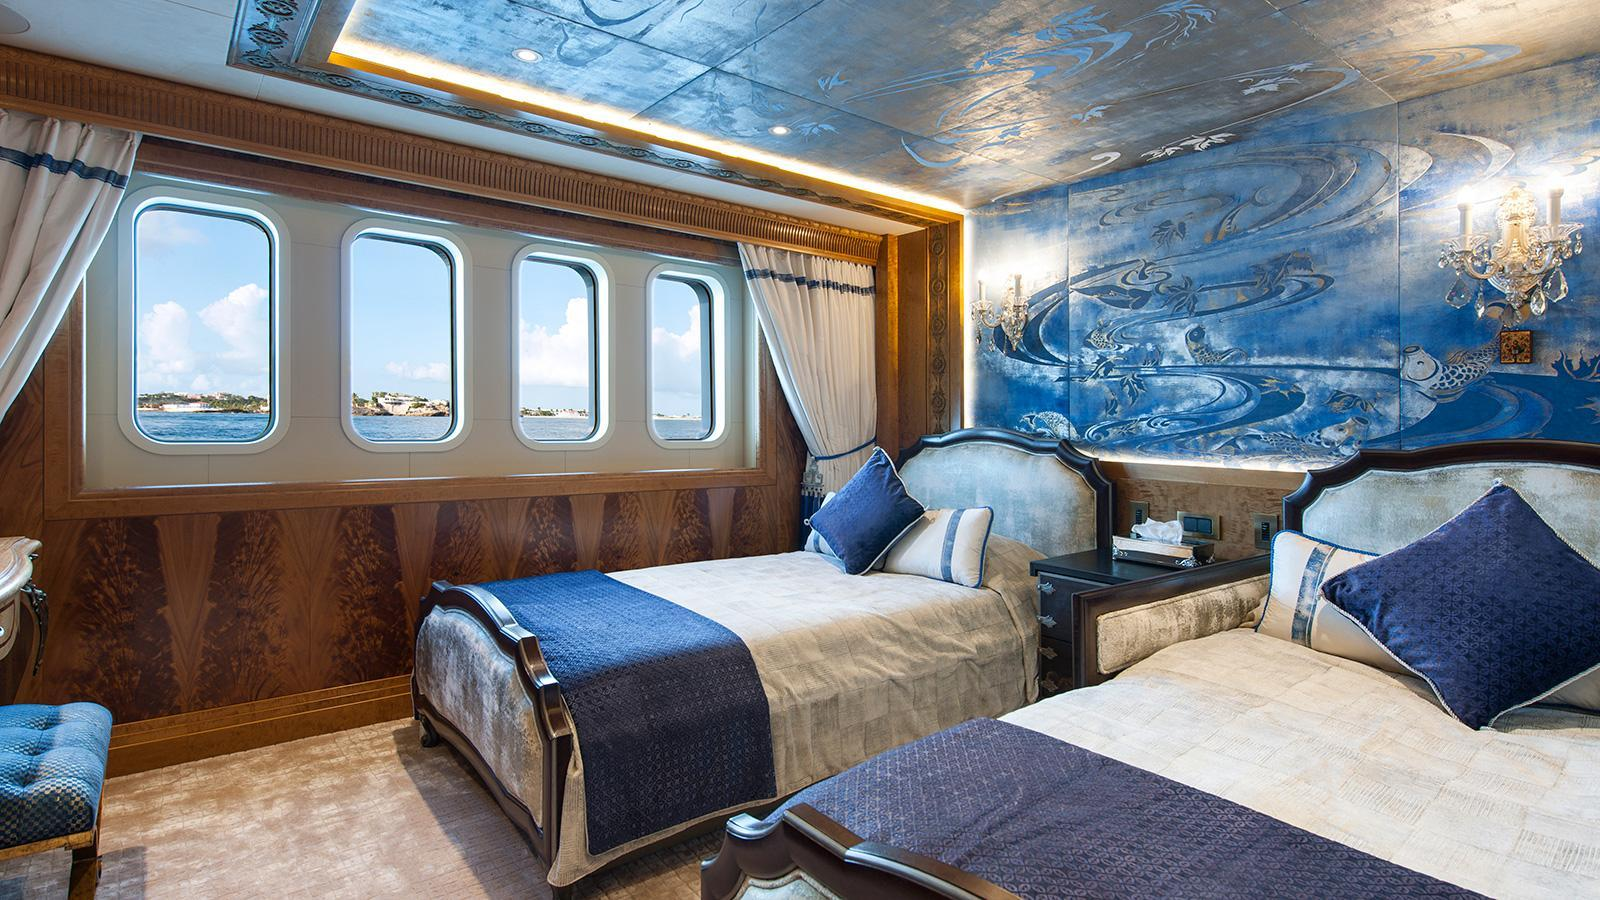 iroquois ester iii motor yacht lurssen 2014 66m twin cabins